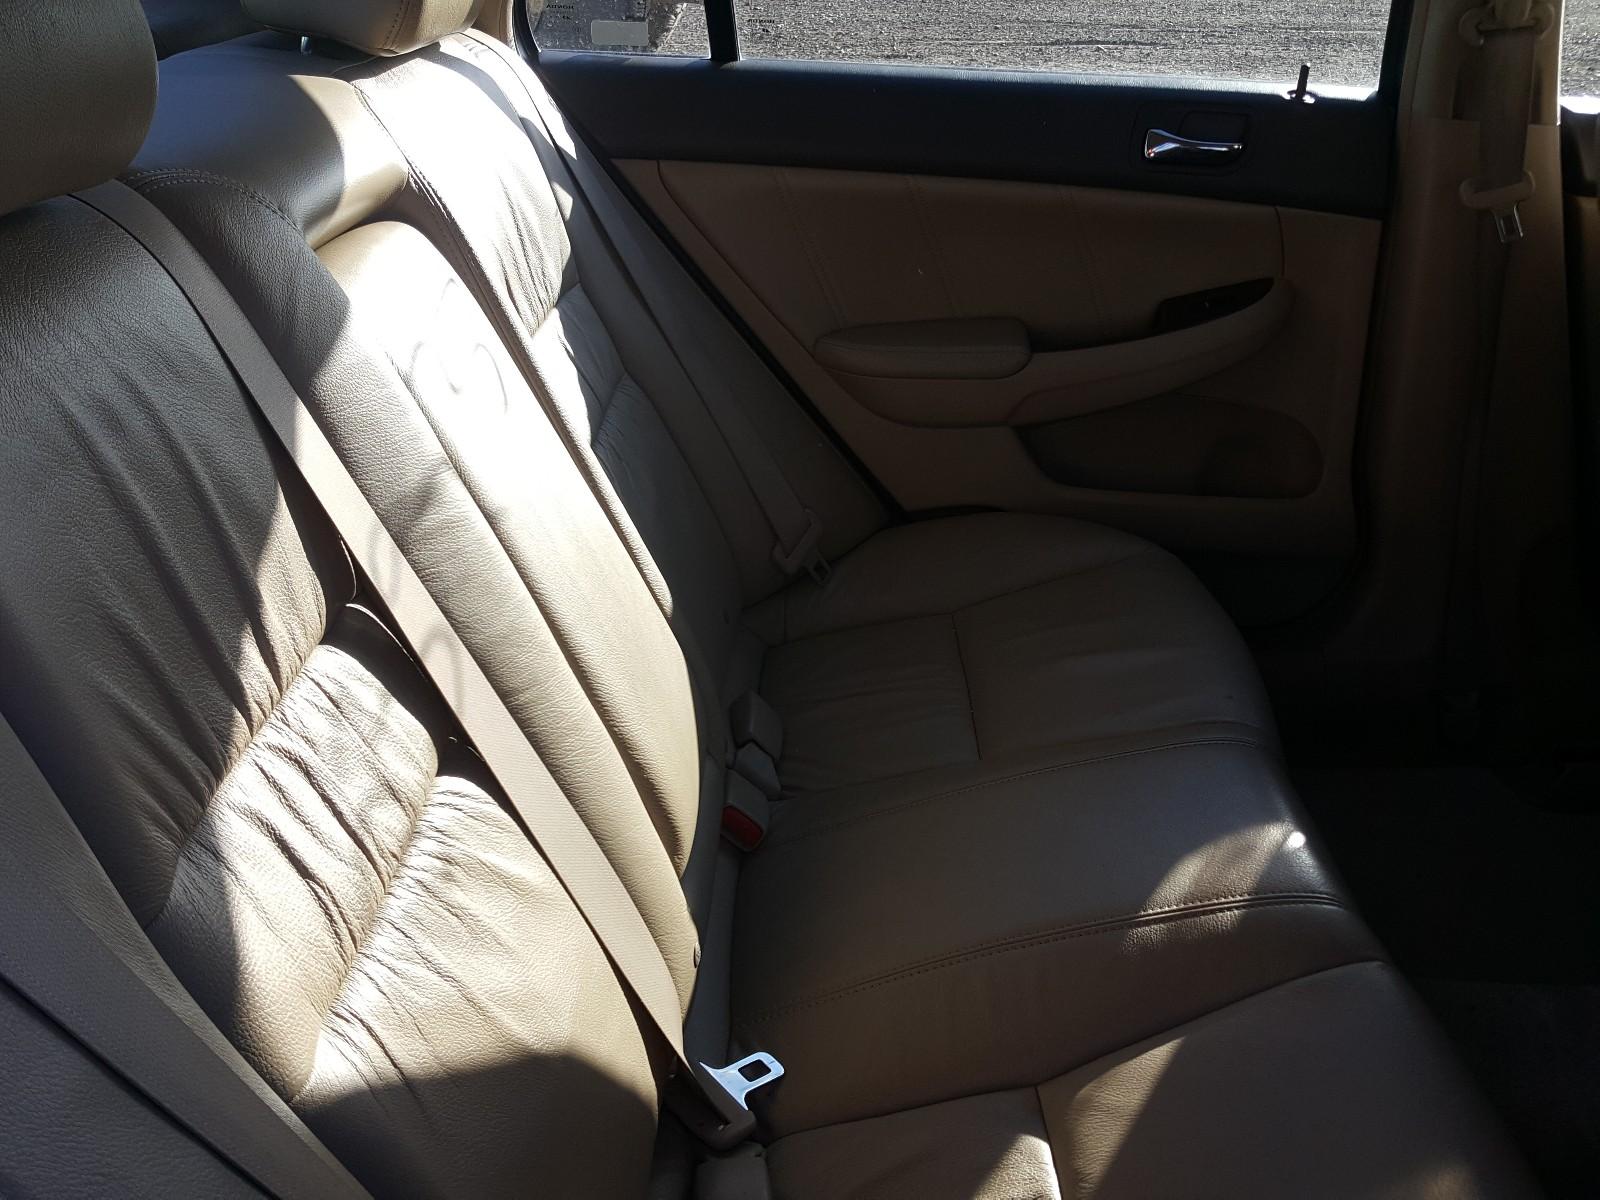 1HGCM66537A007991 - 2007 Honda Accord Ex 3.0L detail view